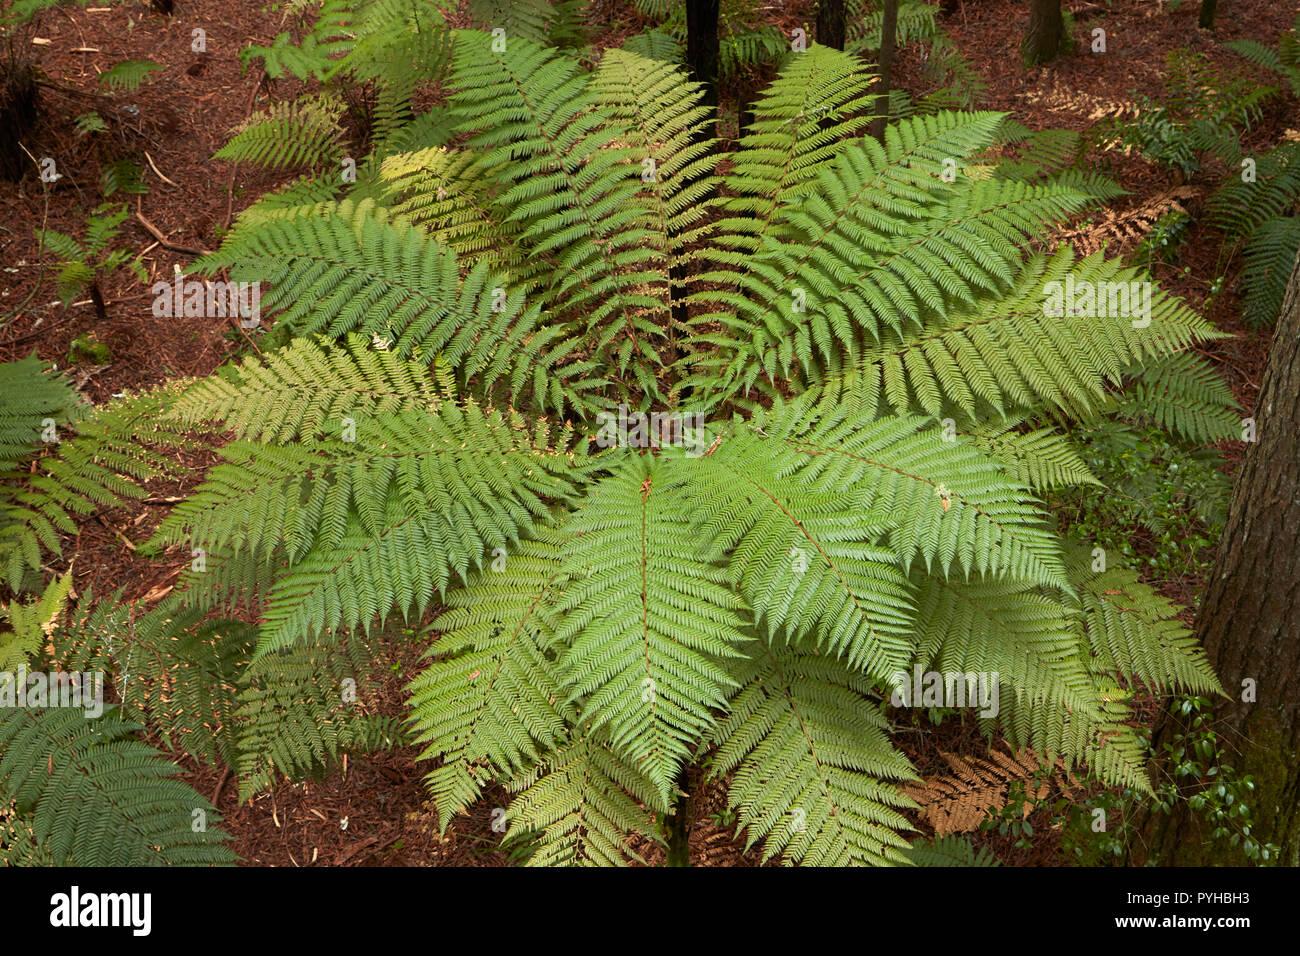 Tree fern, Redwoods Forest, Rotorua, North Island, New Zealand - Stock Image